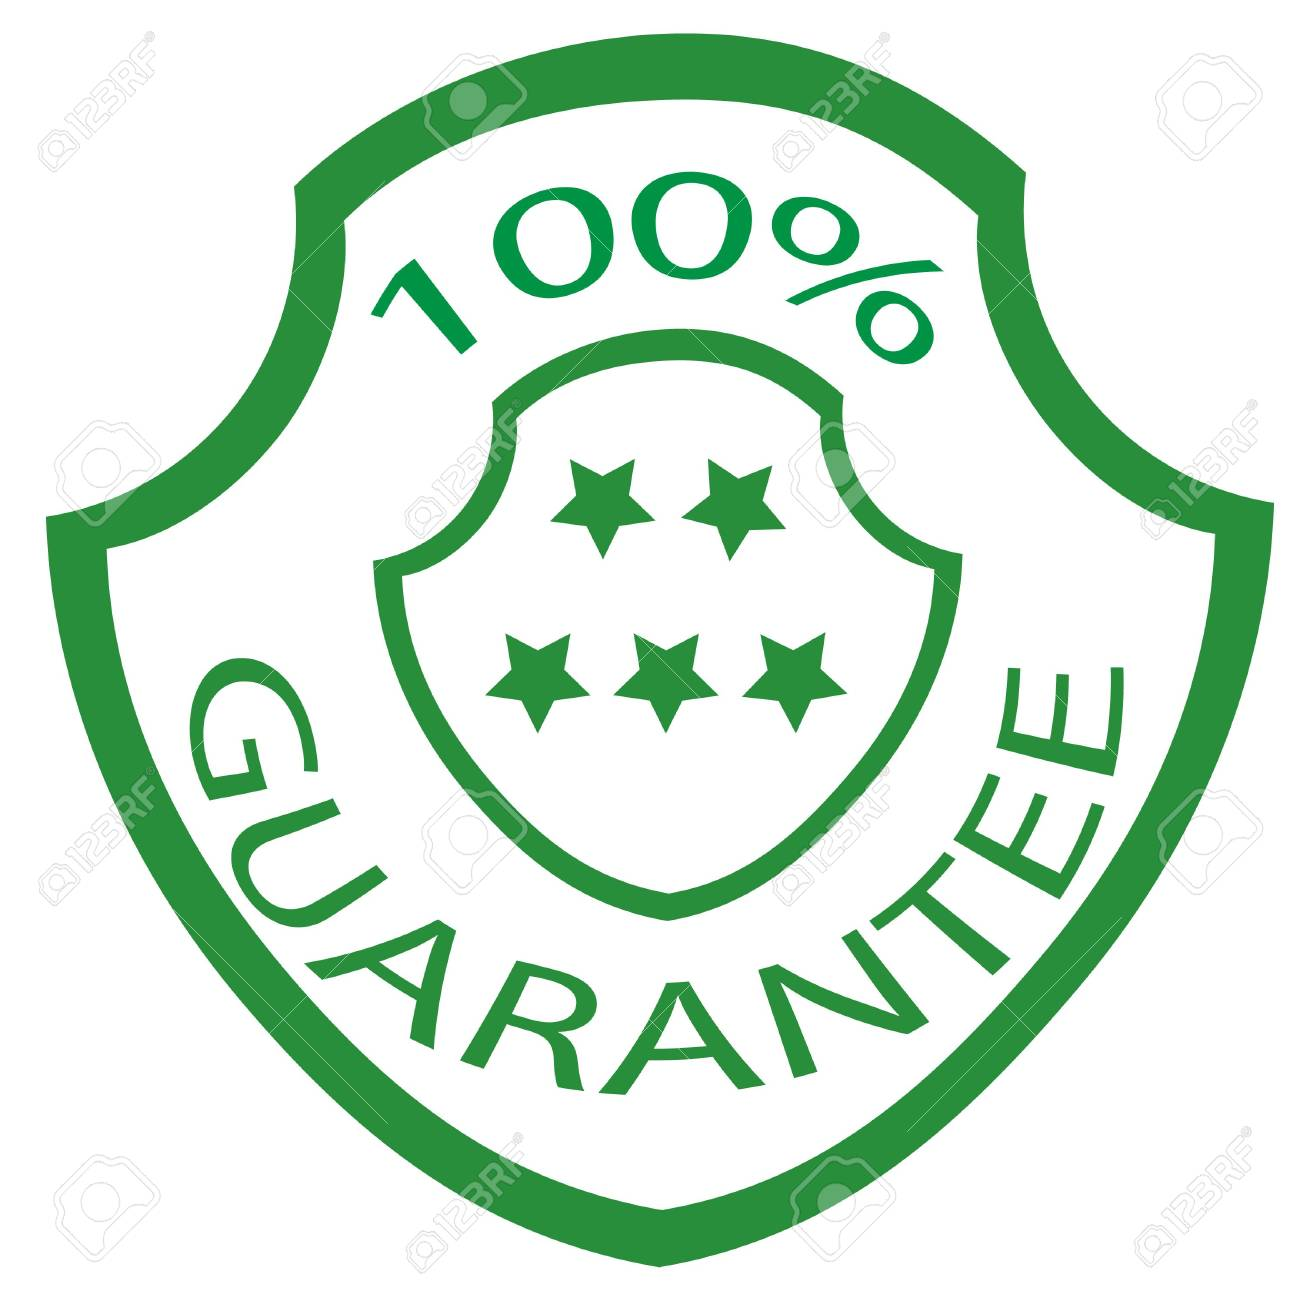 guarantee stamp Stock Photo - 3887845